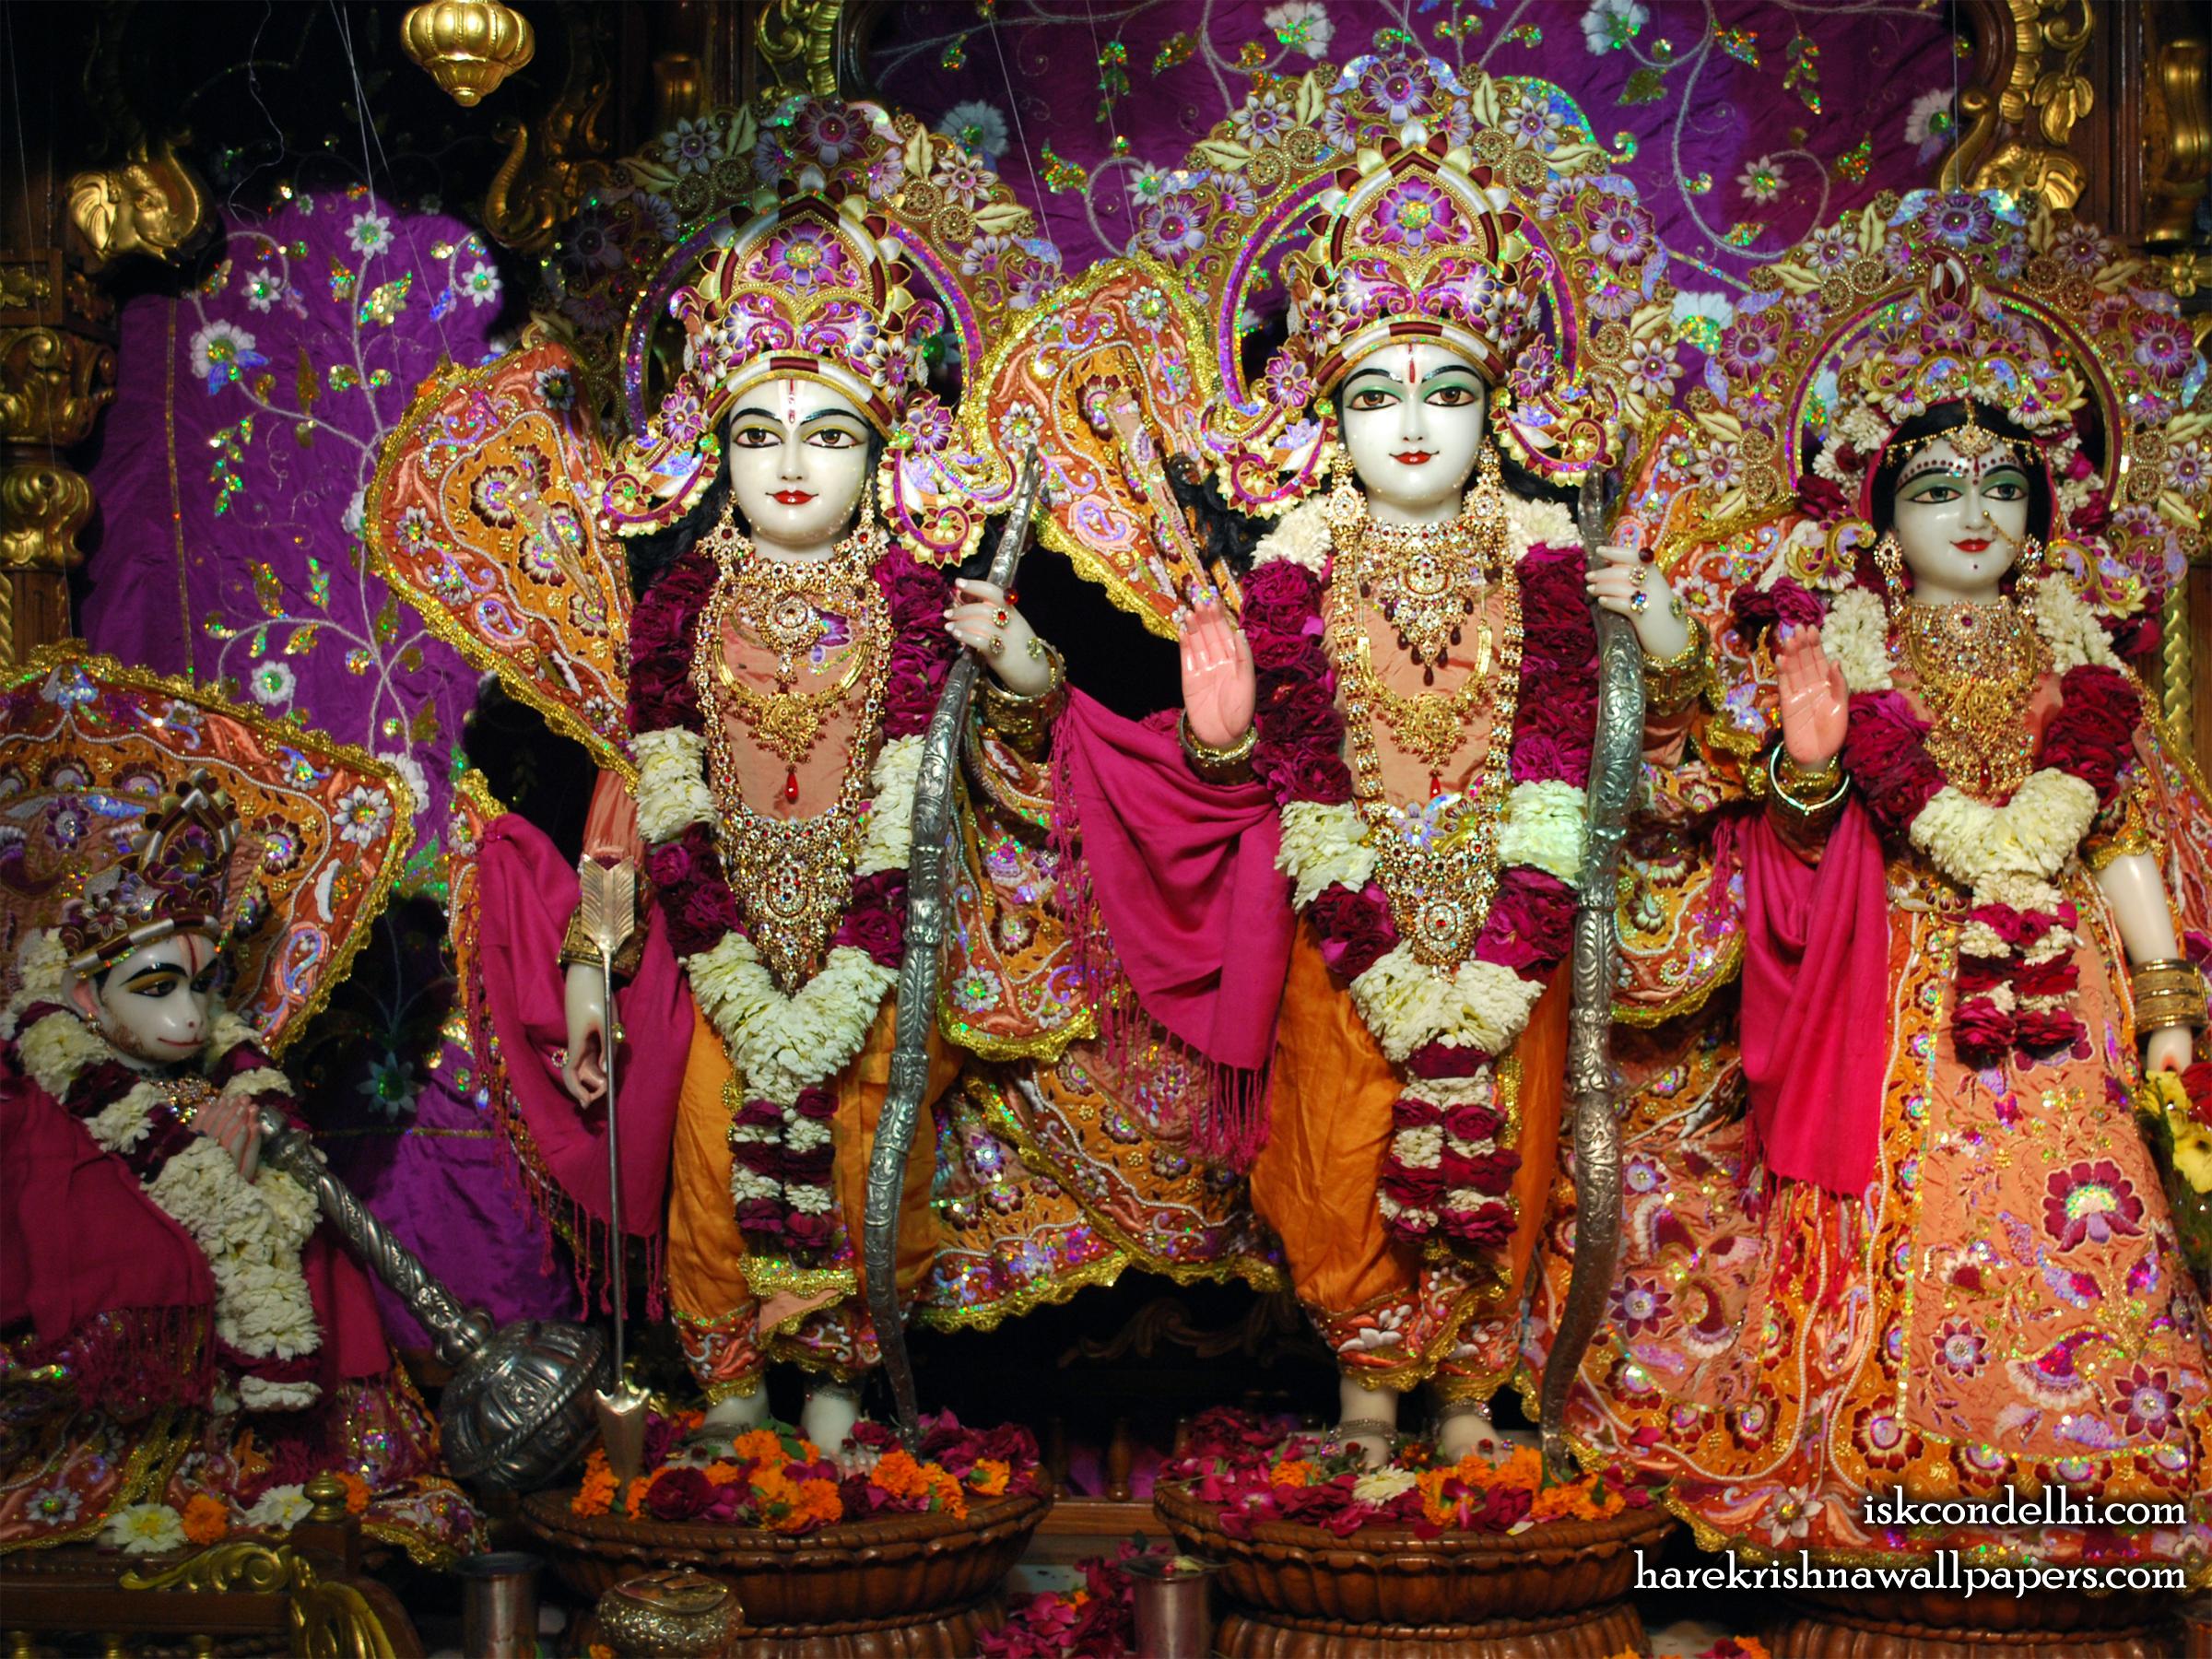 Sri Sri Sita Rama Laxman Hanuman Wallpaper (008) Size 2400x1800 Download